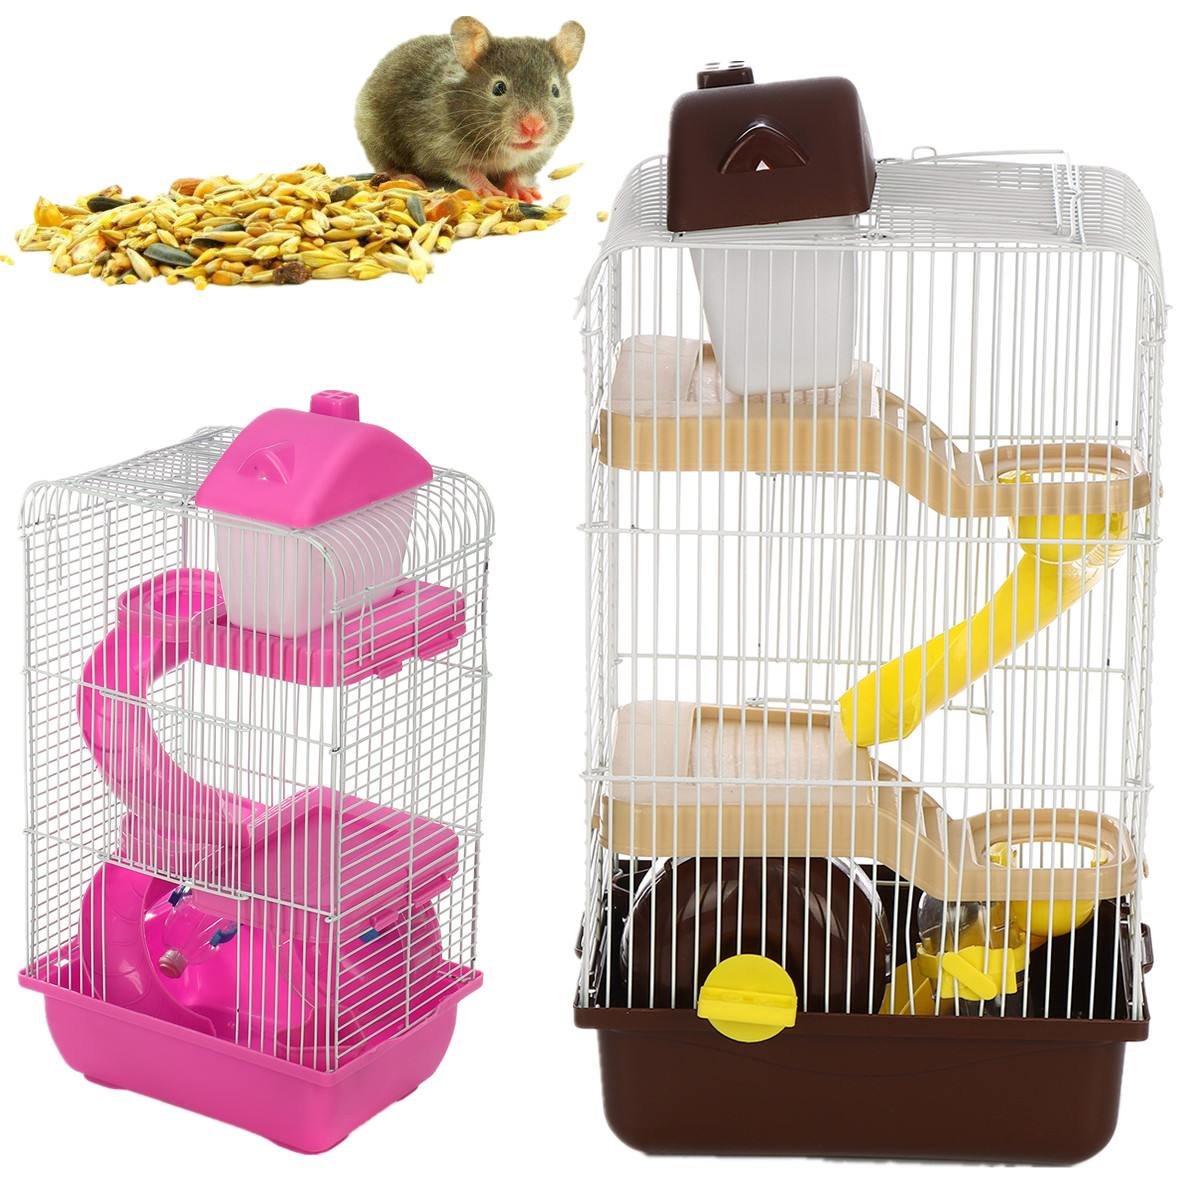 Transparent Diy 3 Floors Storey Gorgeous Hamster Cage Pet Small Animals Castle Roller Slide House Multi-function Plastic Metal